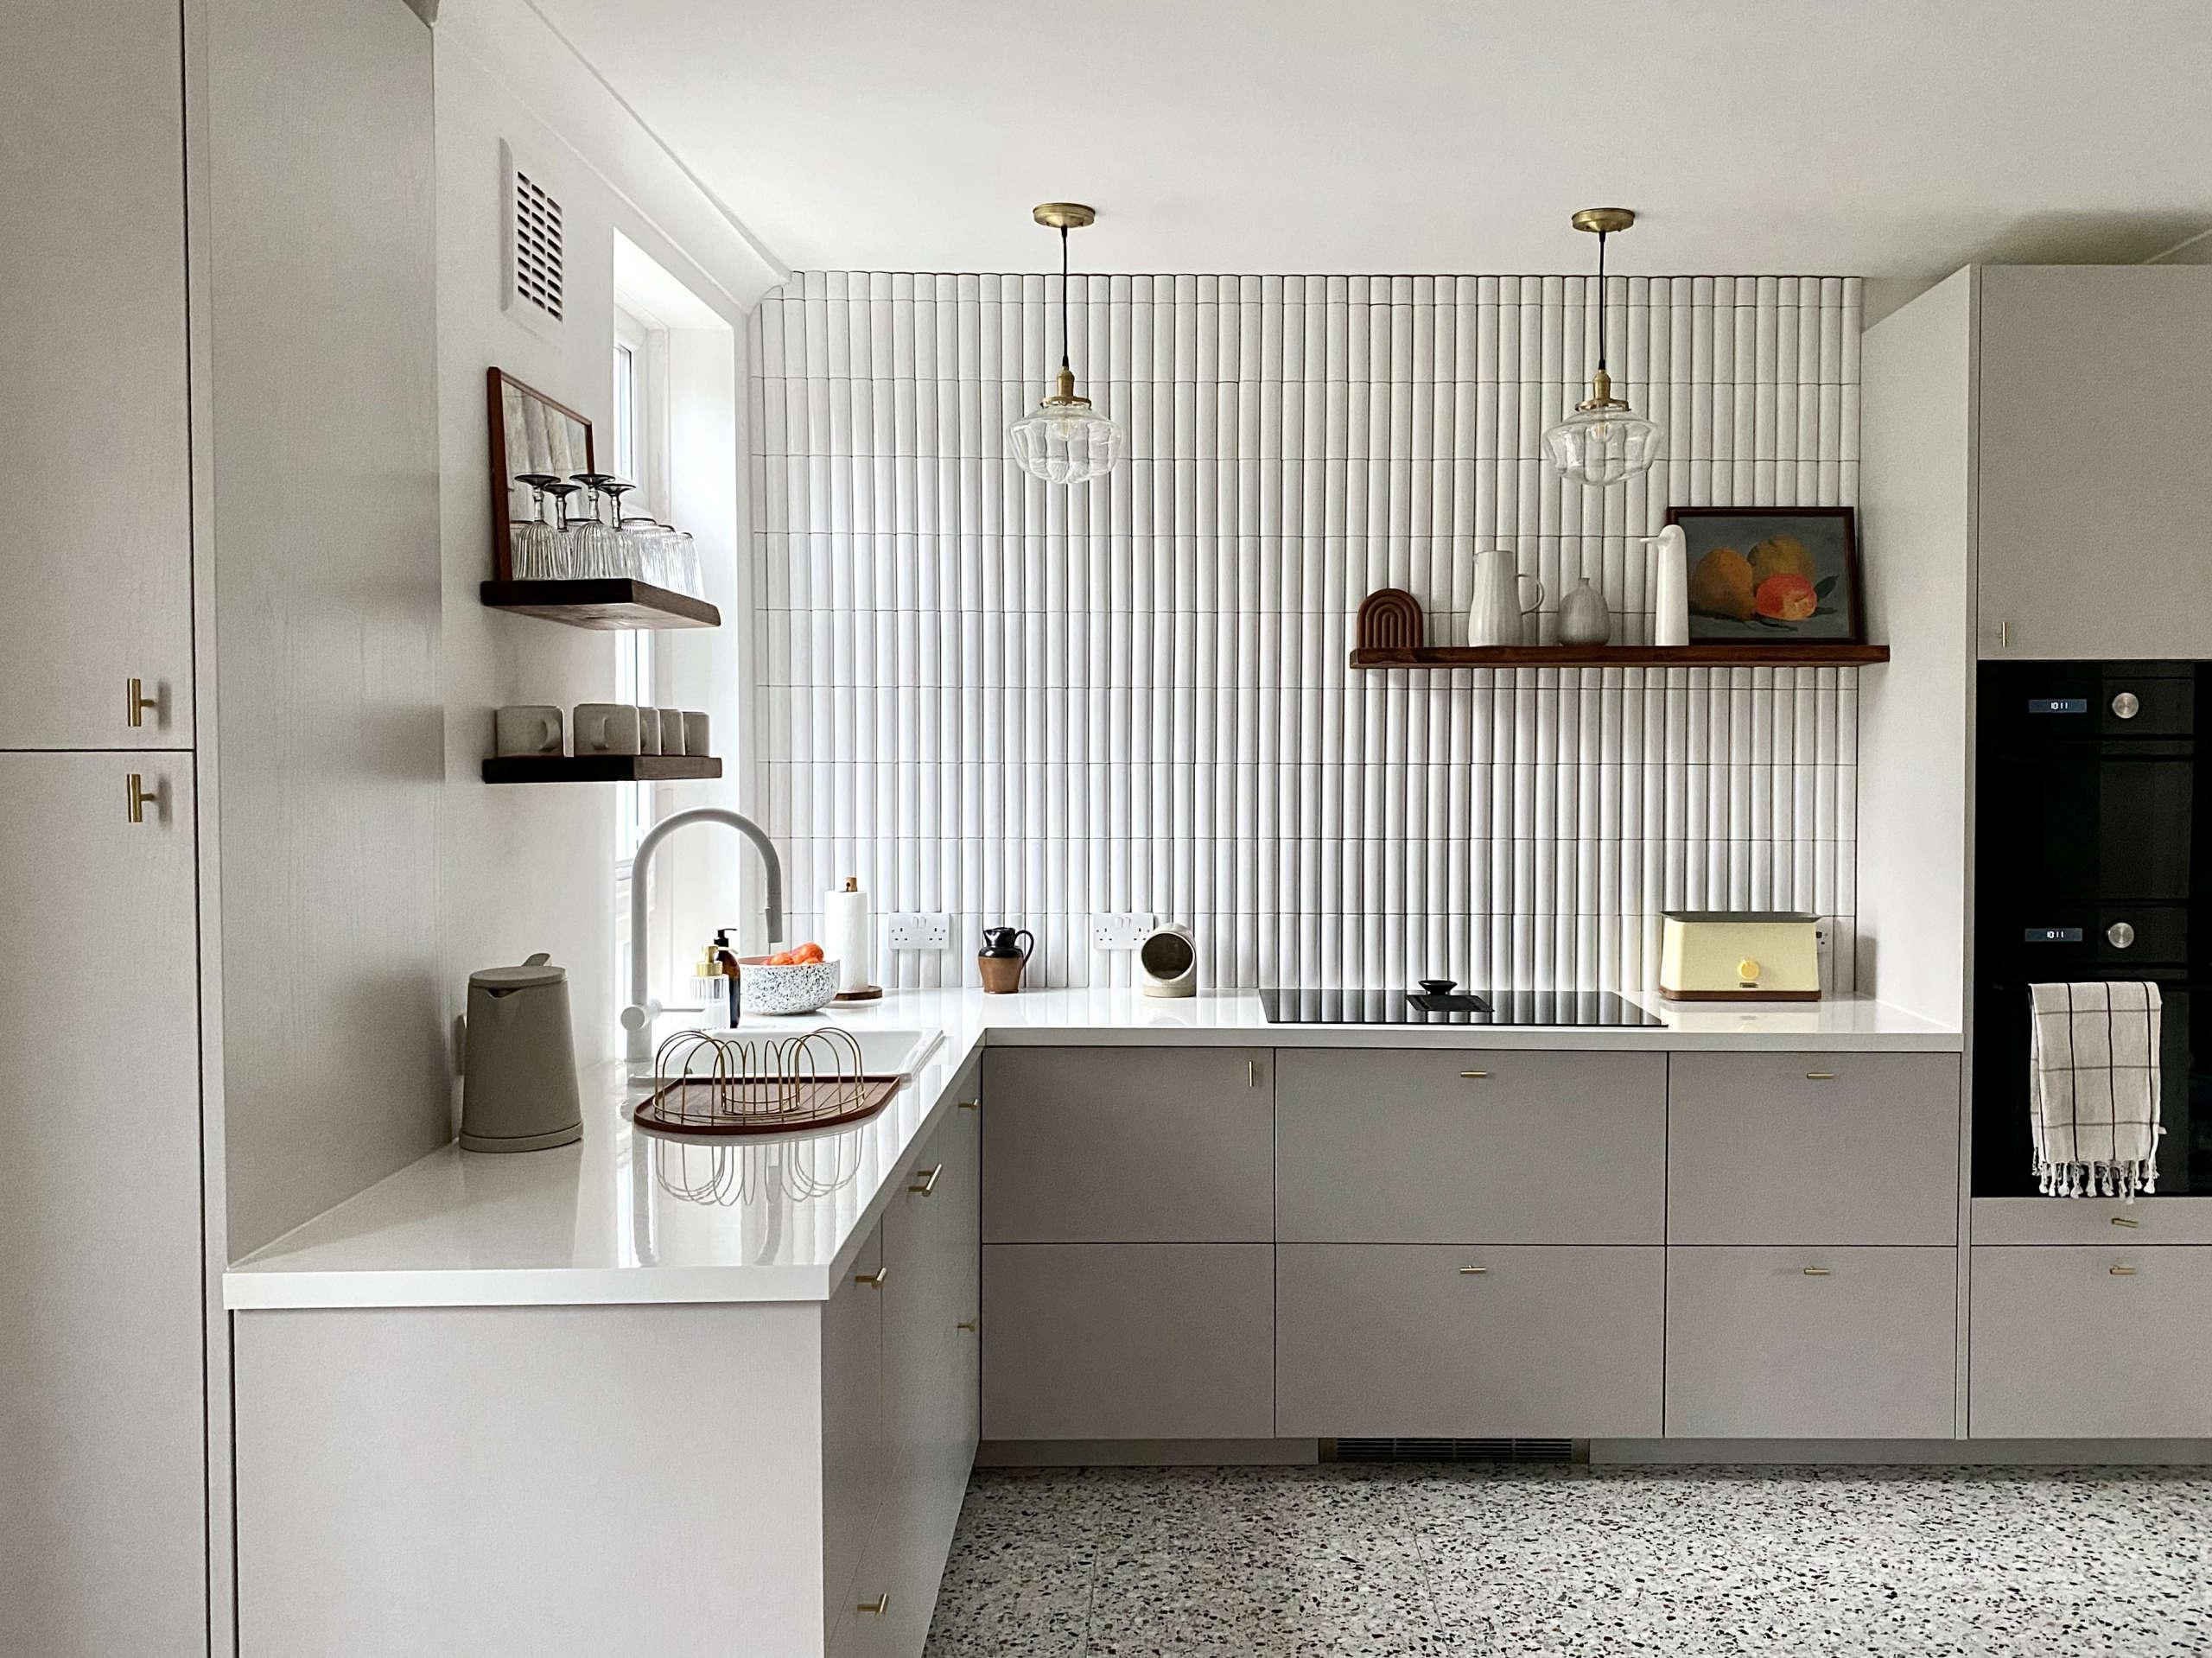 Ferren Gipson's artful new kitchen, Ikea included